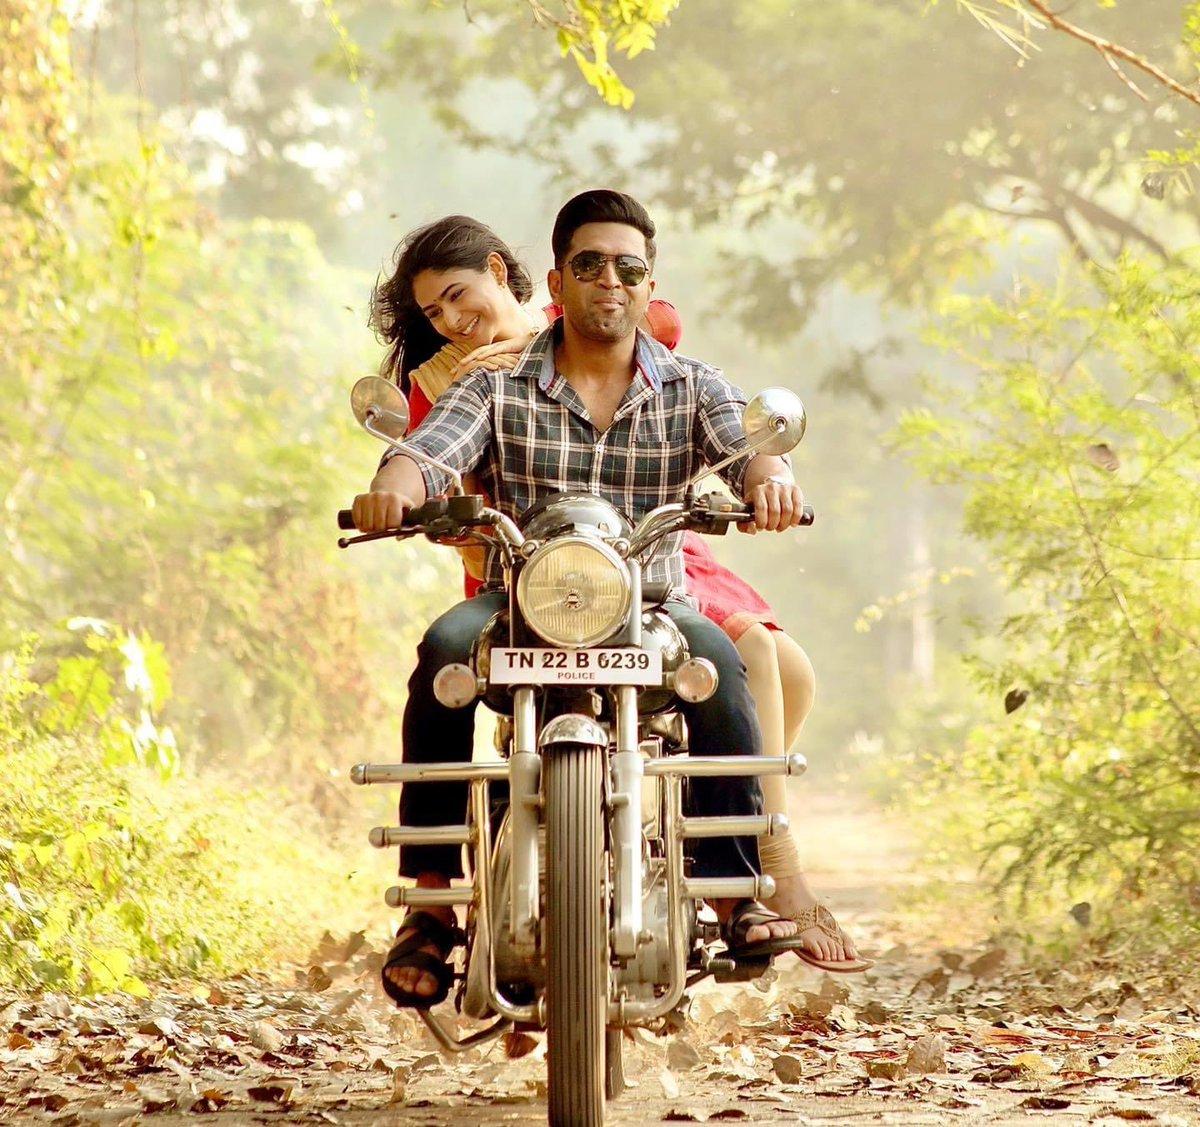 A fresh still from the upcoming movie #Sinam starring @arunvijayno1 @pallaklalwani and directed by @gnr_kumaravelan